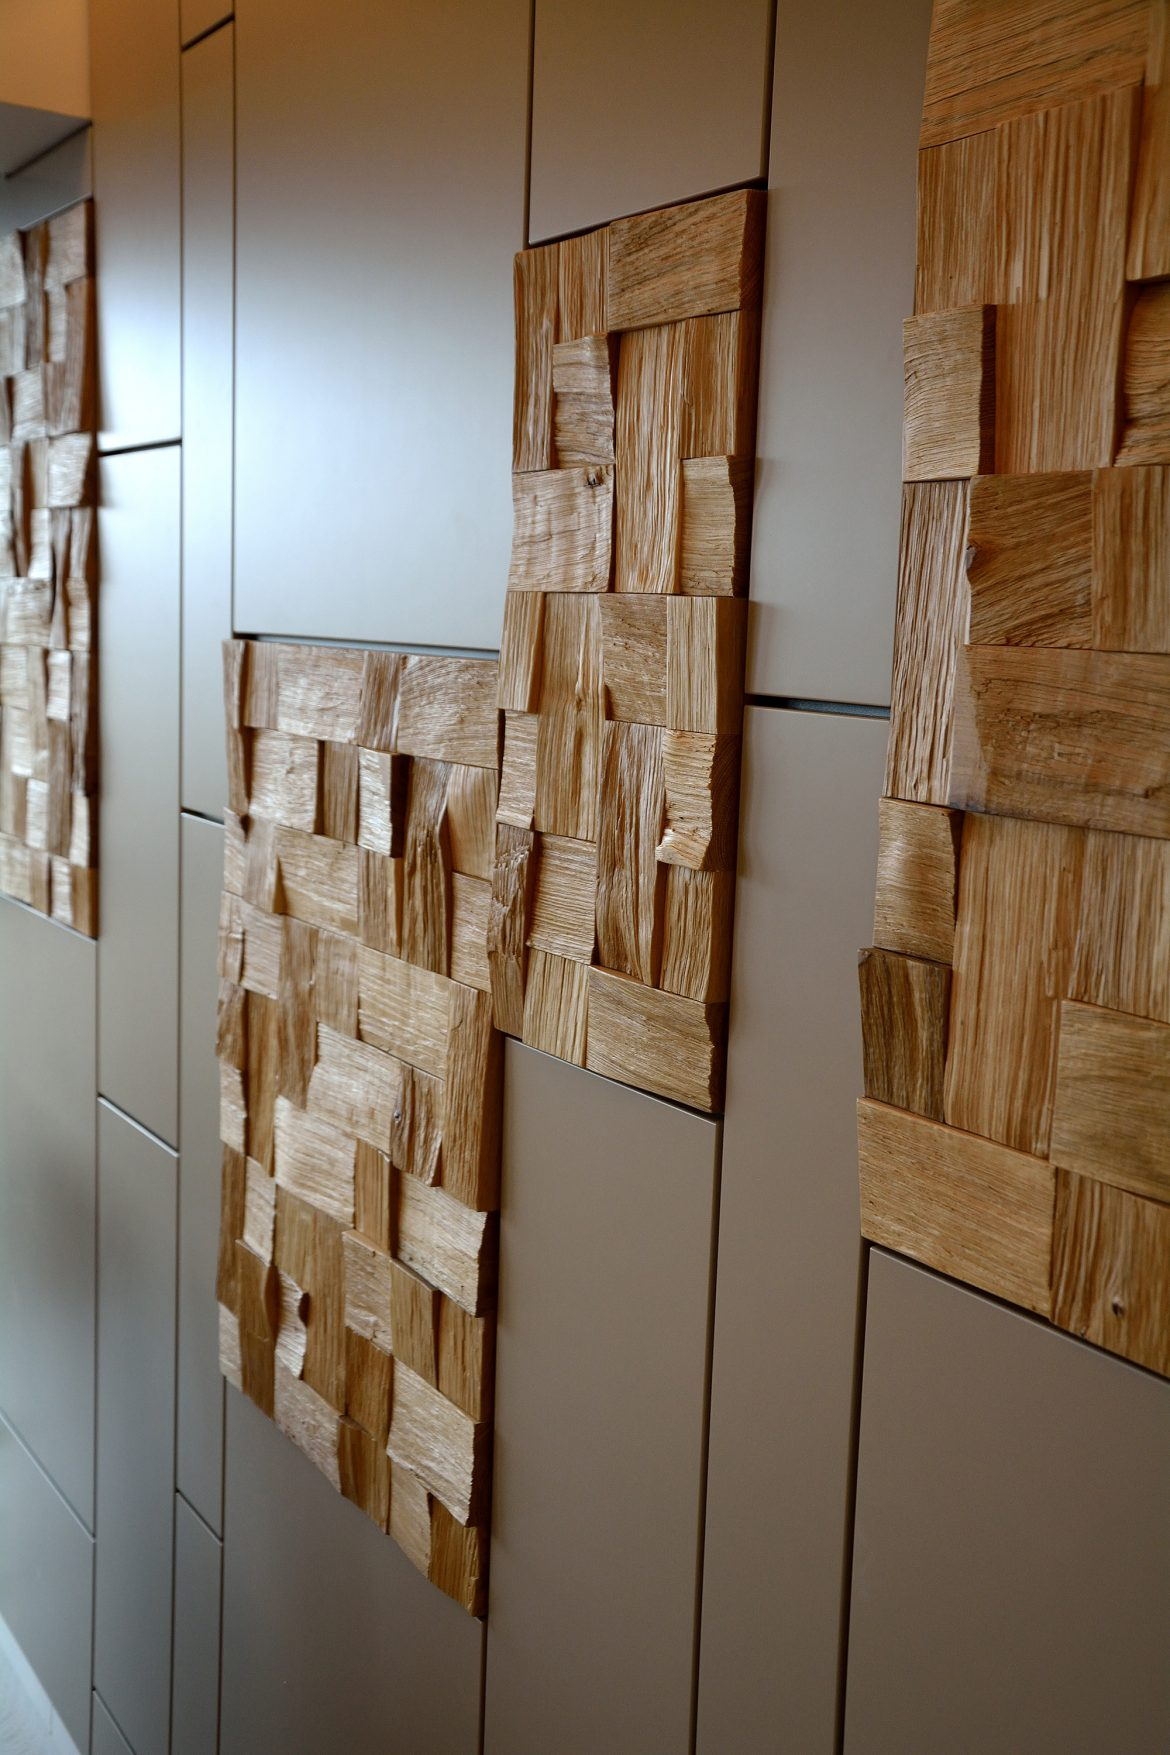 Placare perete complet din Mdf Vopsit Mat Gri in combinatie cu placi decorative din Stejar Masiv natur